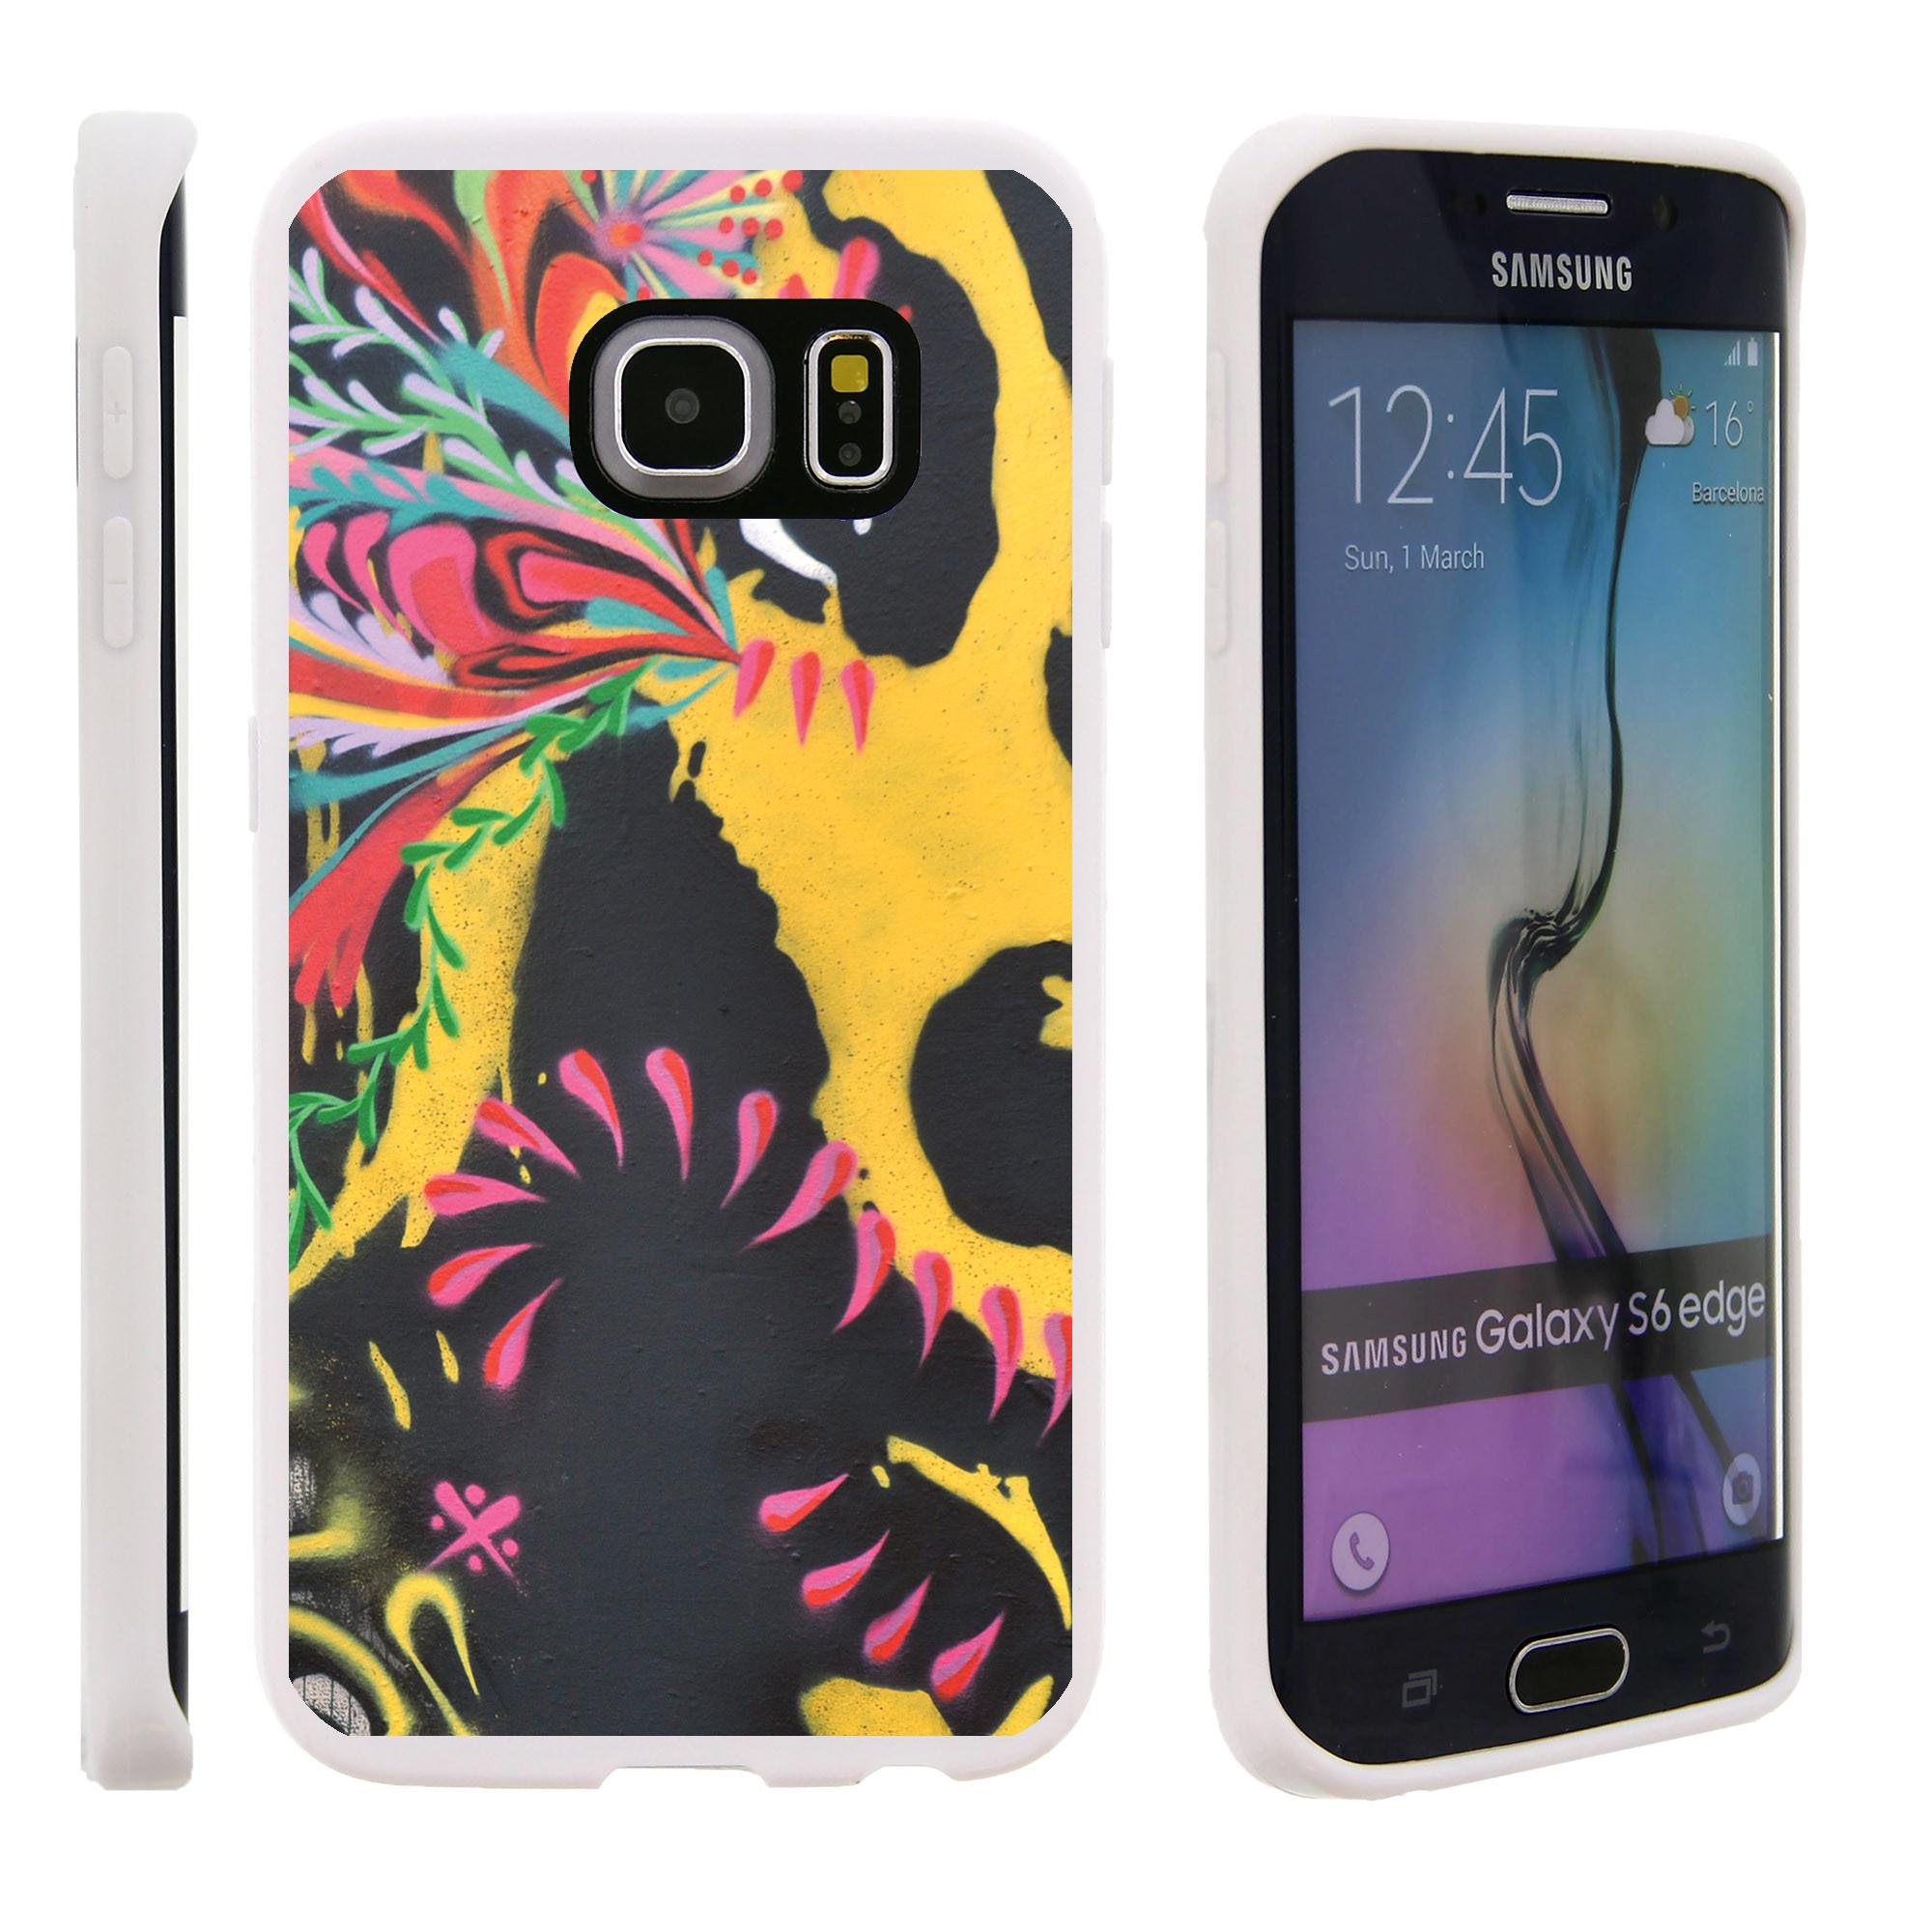 Samsung Galaxy S6 Edge G925, Flexible Case [FLEX FORCE] Slim Durable TPU Sleek Bumper with Unique Designs - Paint Splatter